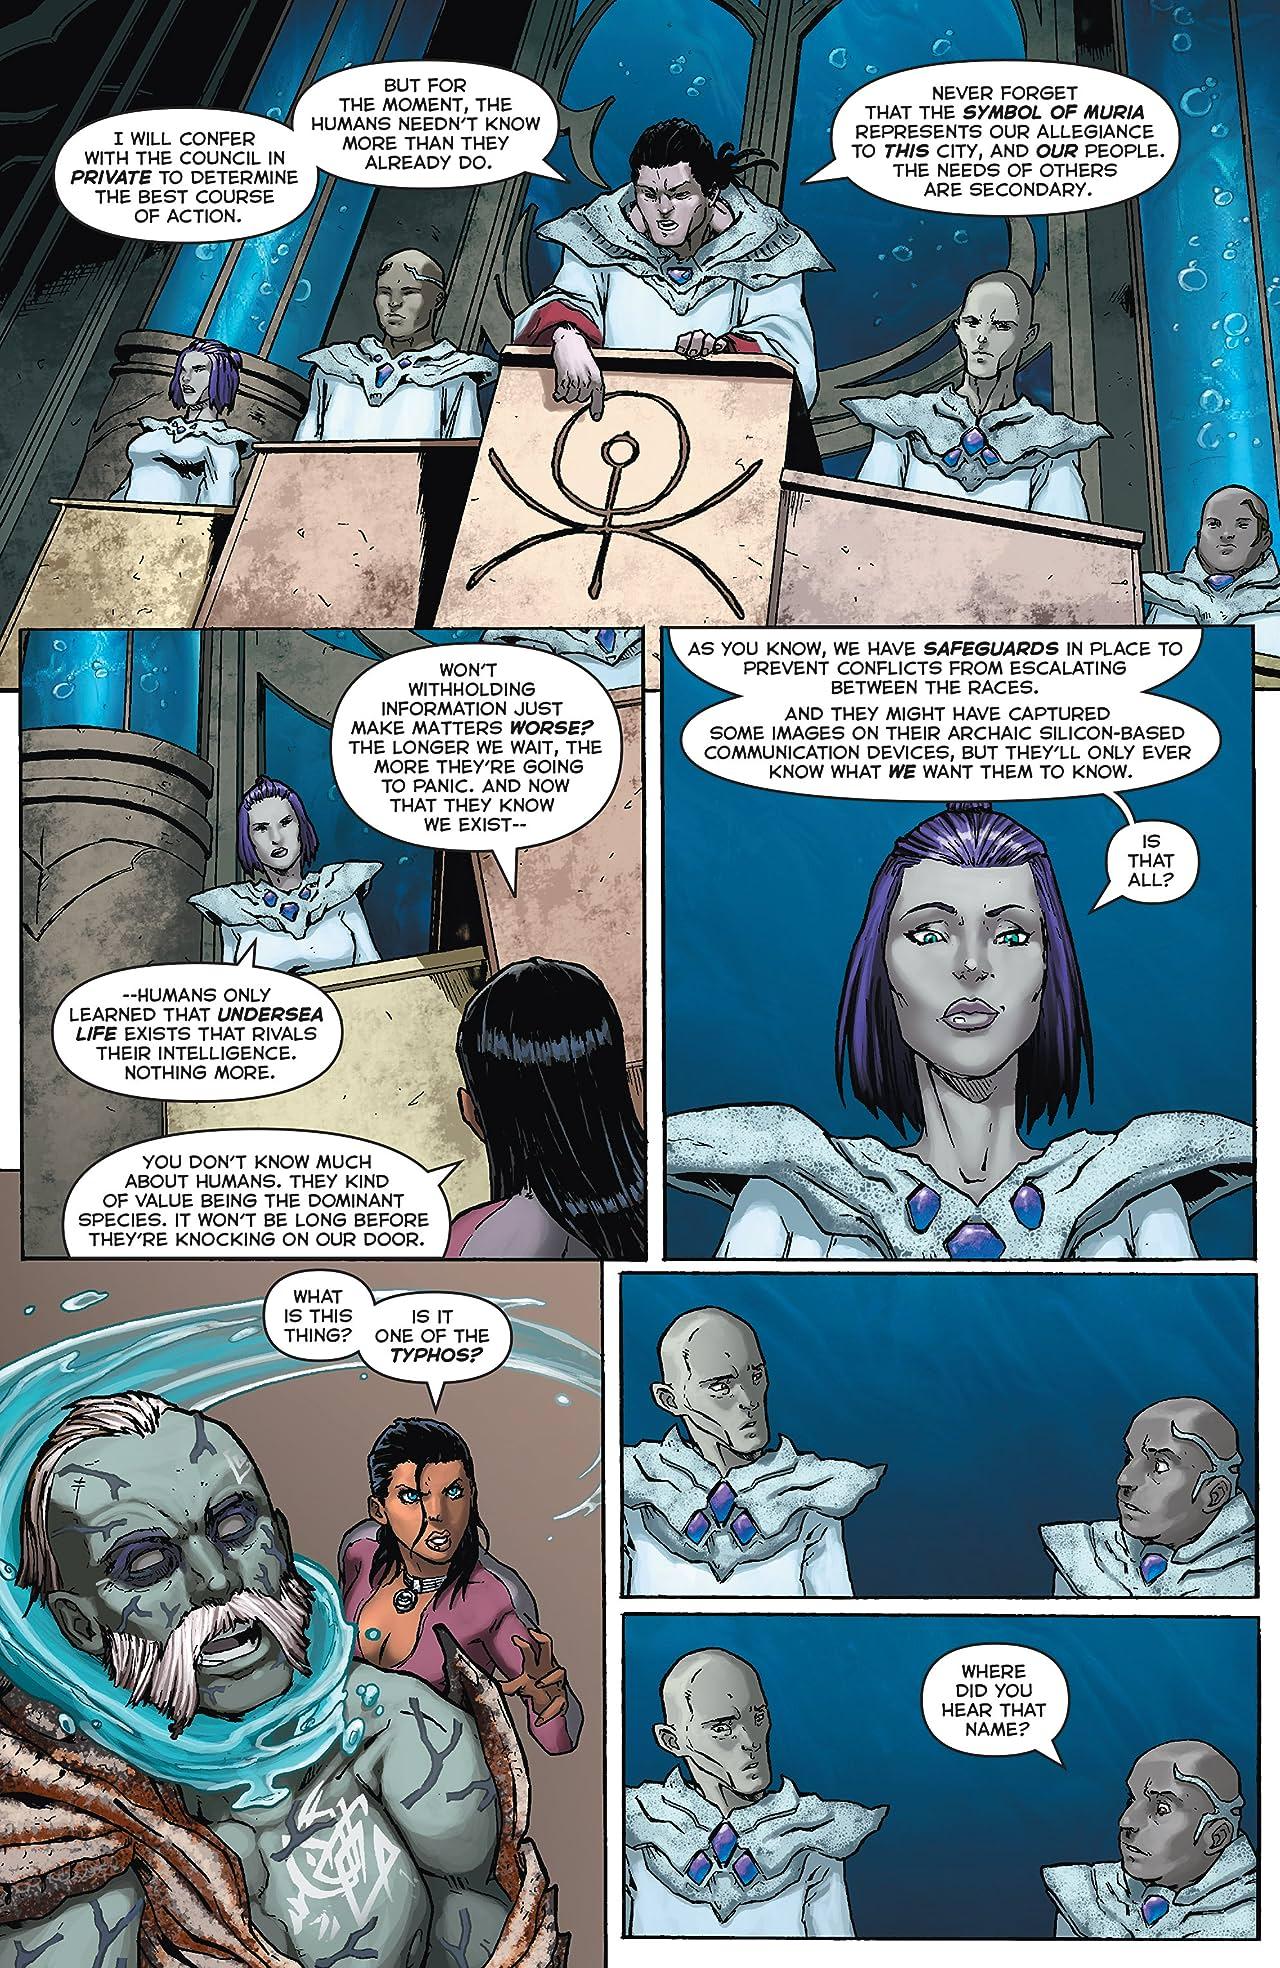 All-New Fathom Vol. 6 #2 (of 8)